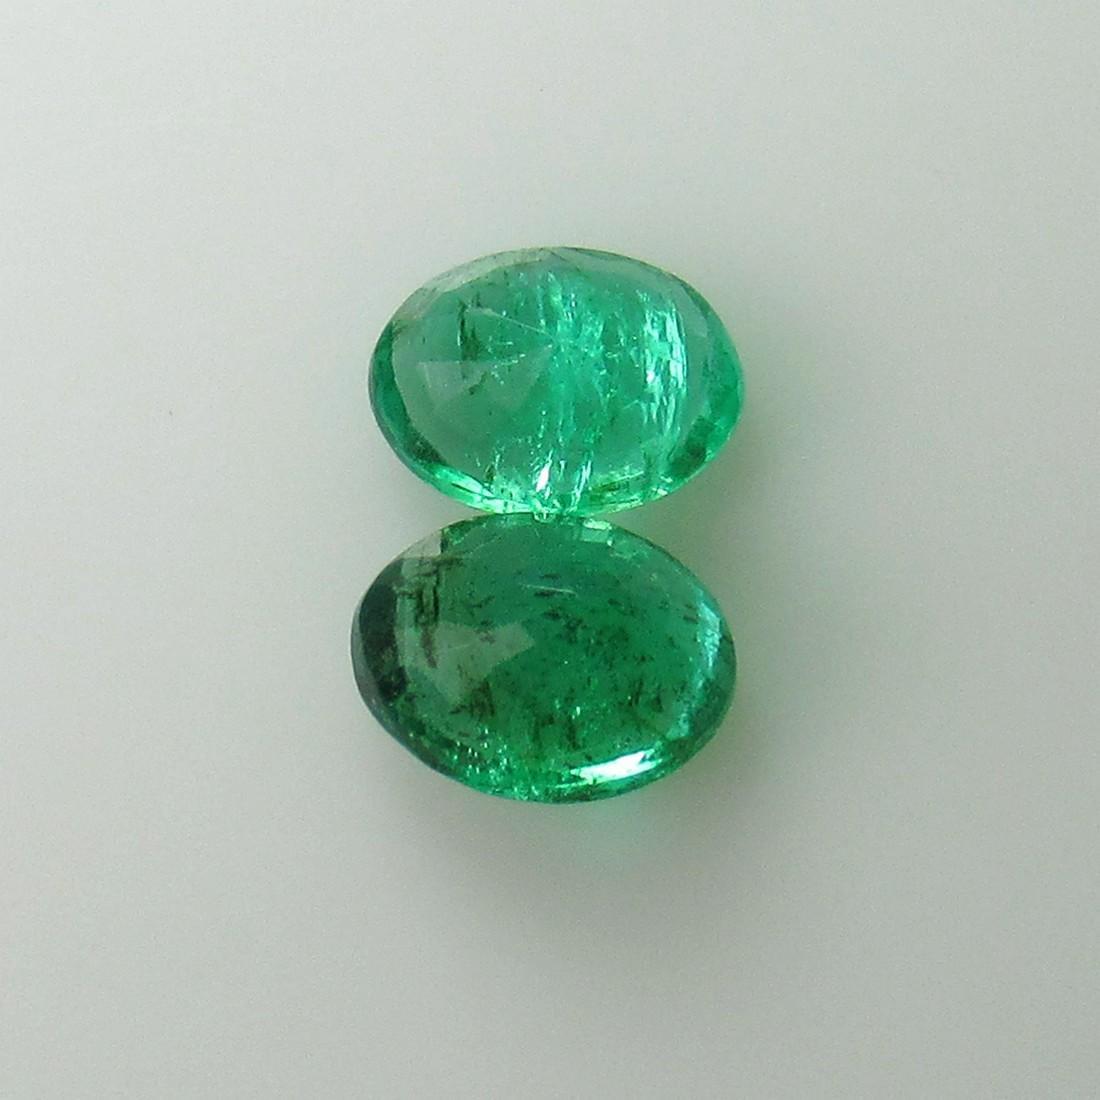 1.02 Ct Genuine Zambian Emerald 6X4.5 mm Oval Pair - 3